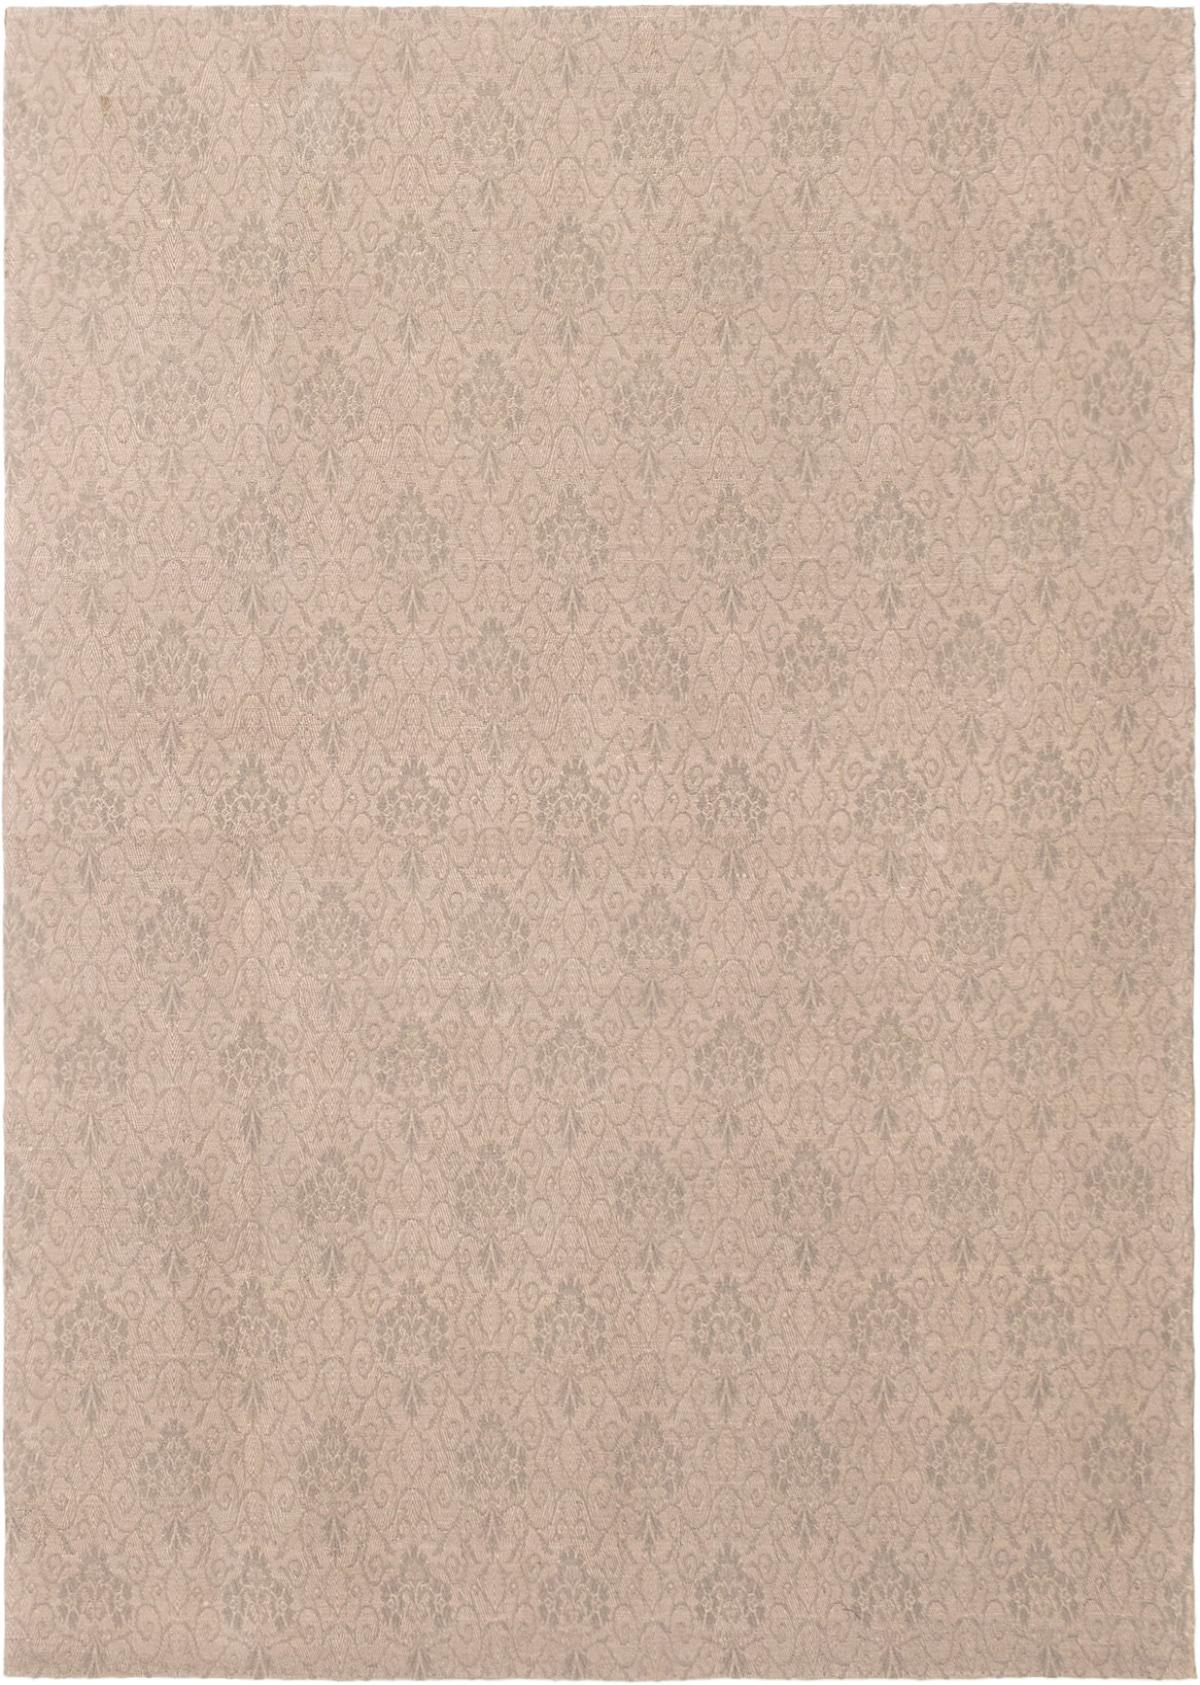 "Handmade Collage Dark Grey, Light Grey Chenille Rug 4'9"" x 6'9""  Size: 4'9"" x 6'9"""